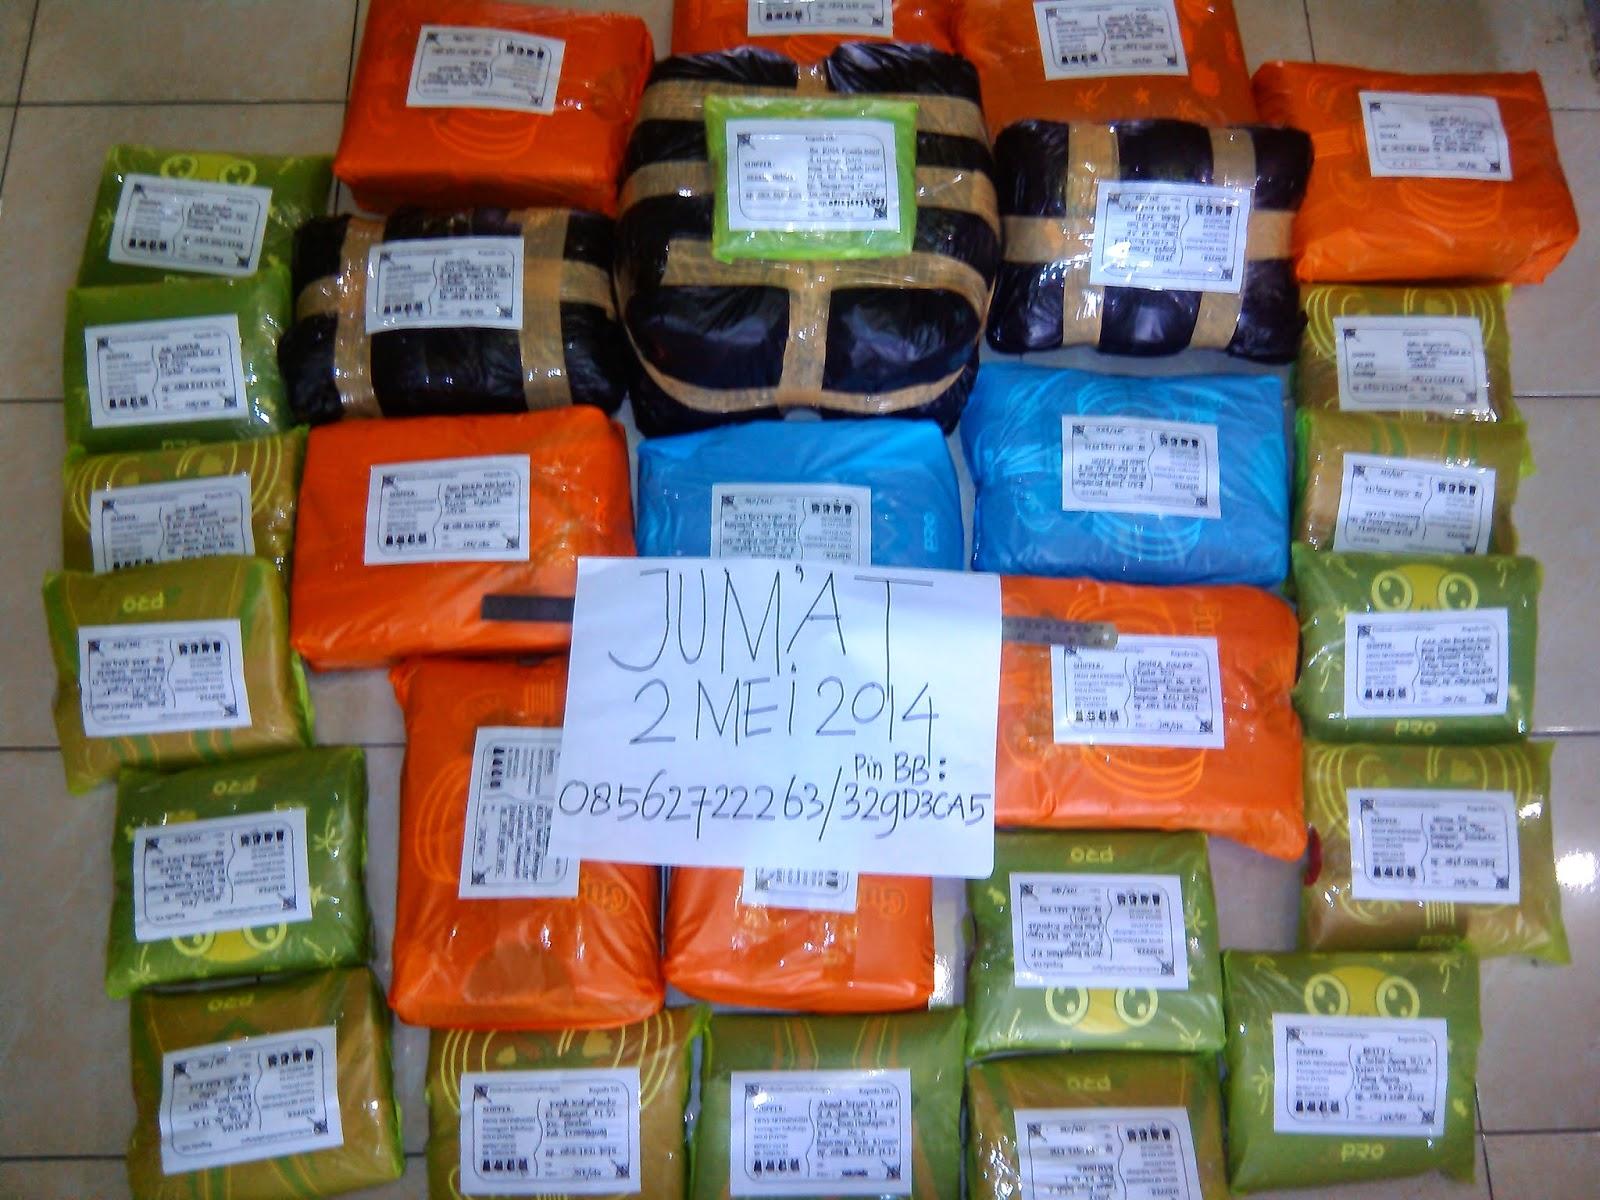 Hp 085627 222 63 Sabuk Bonceng Motor Anak Murah Apro Safety Belt Untuk Pengiriman 2014